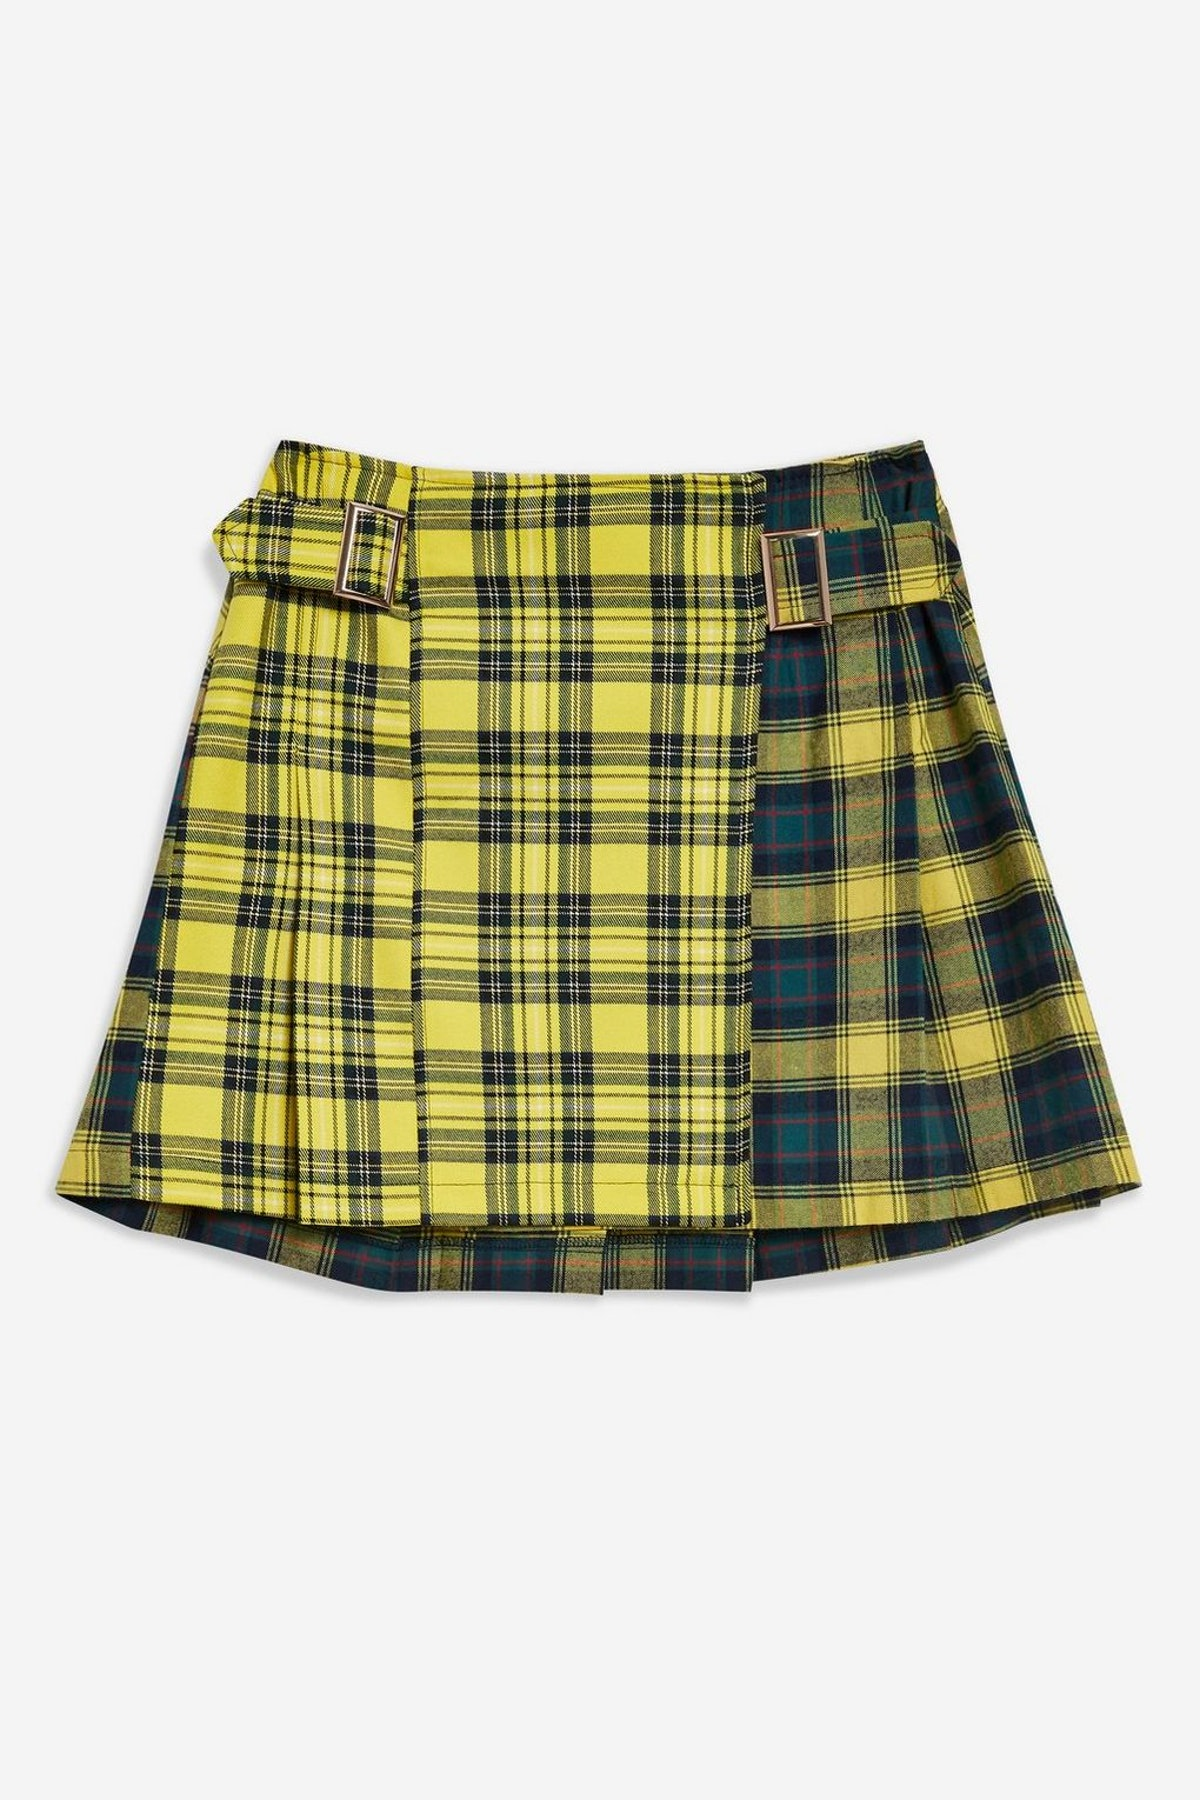 Mixed Check Buckle Kilt Mini Skirt